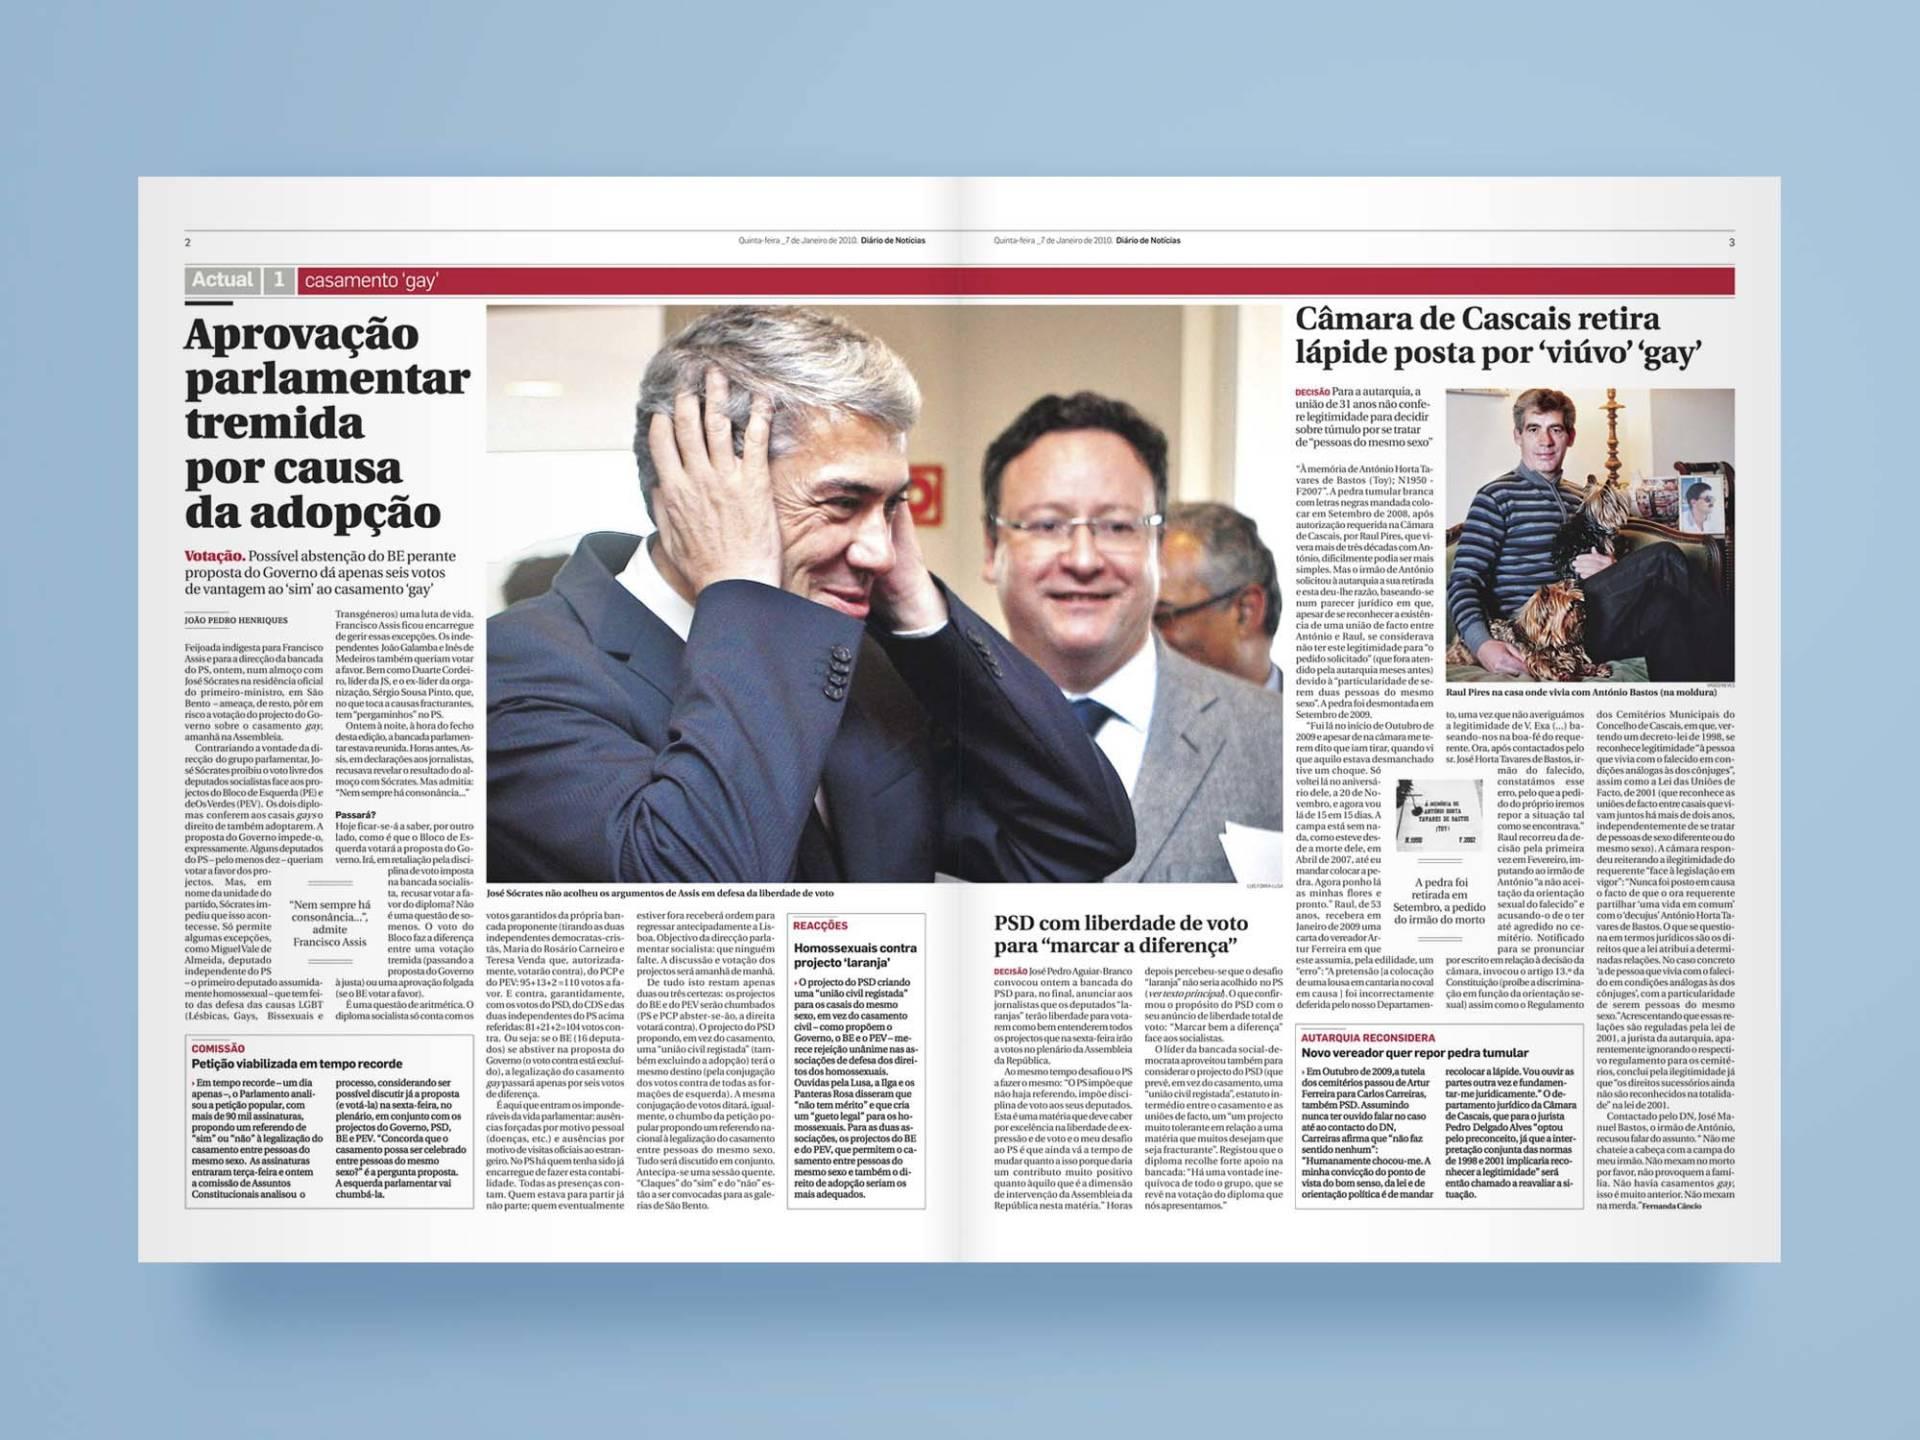 Diario_De_Noticias_02_Wenceslau_News_Design